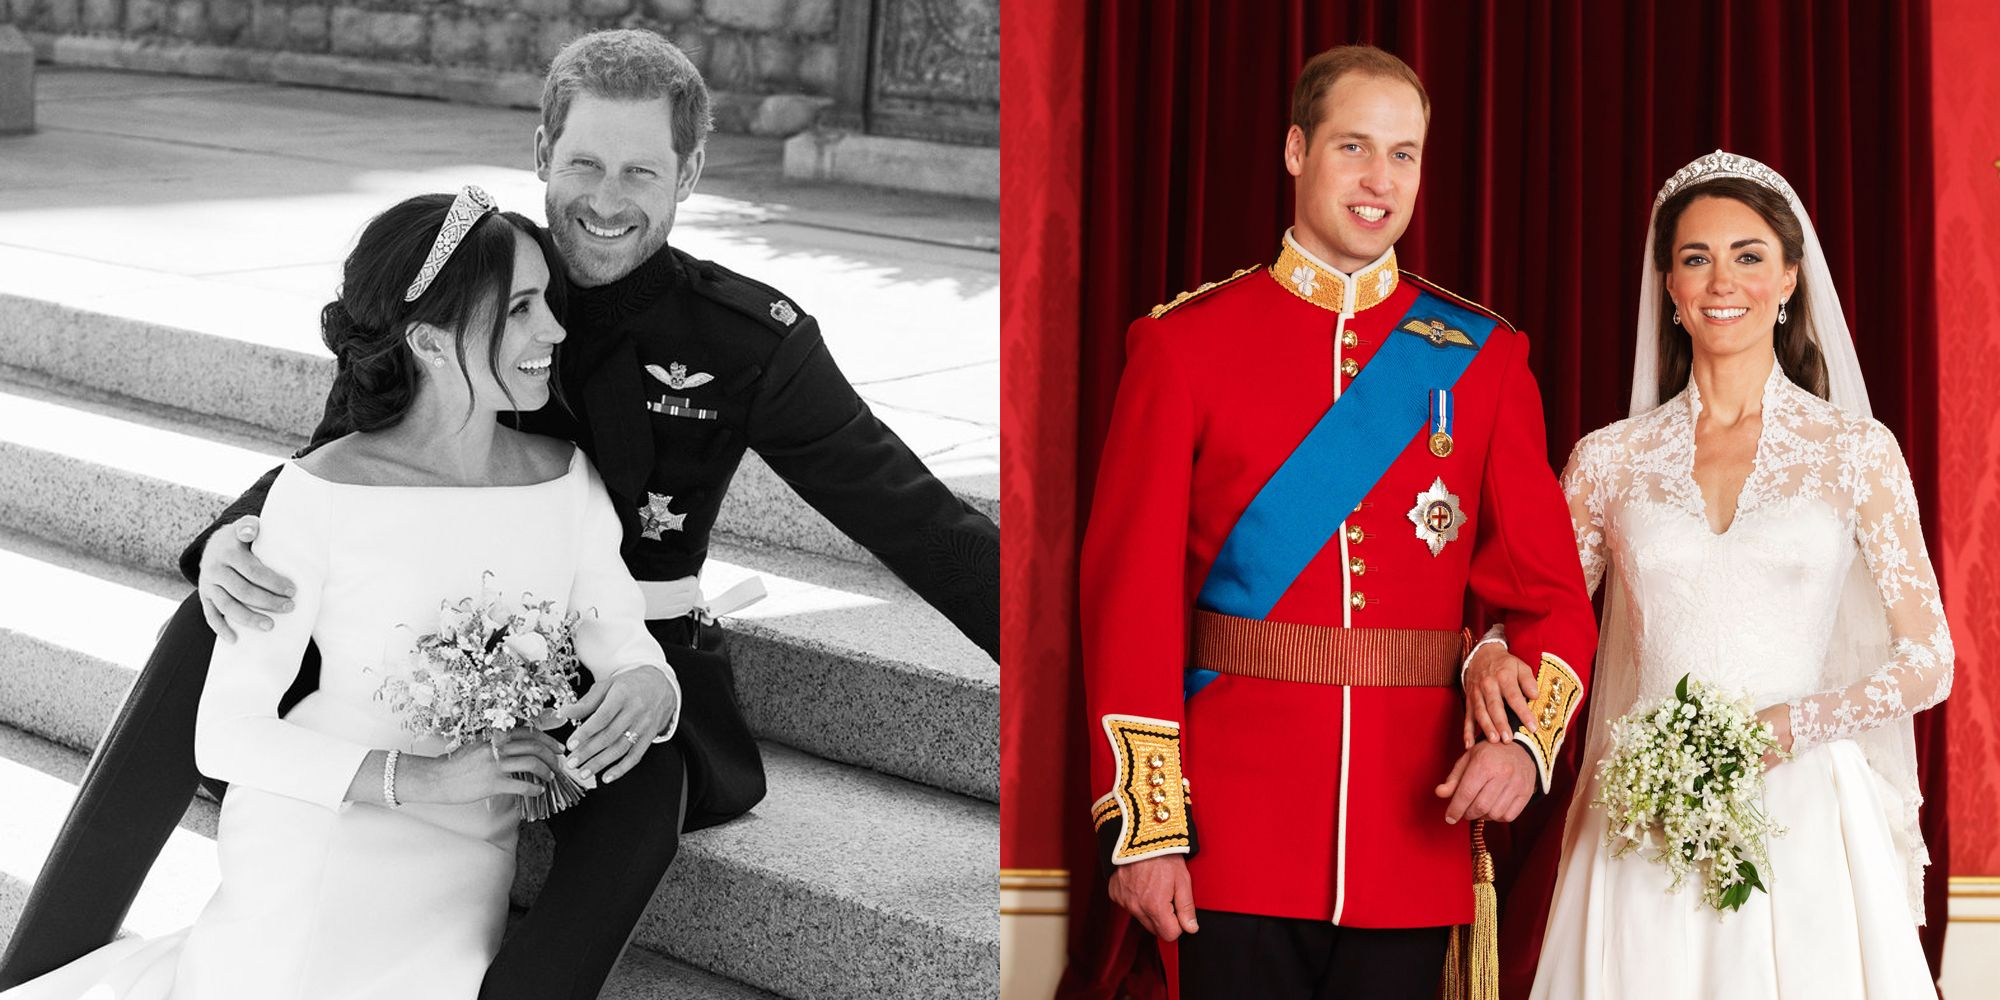 Meghan Markle And Prince Harrys Royal Wedding Portraits Compared To